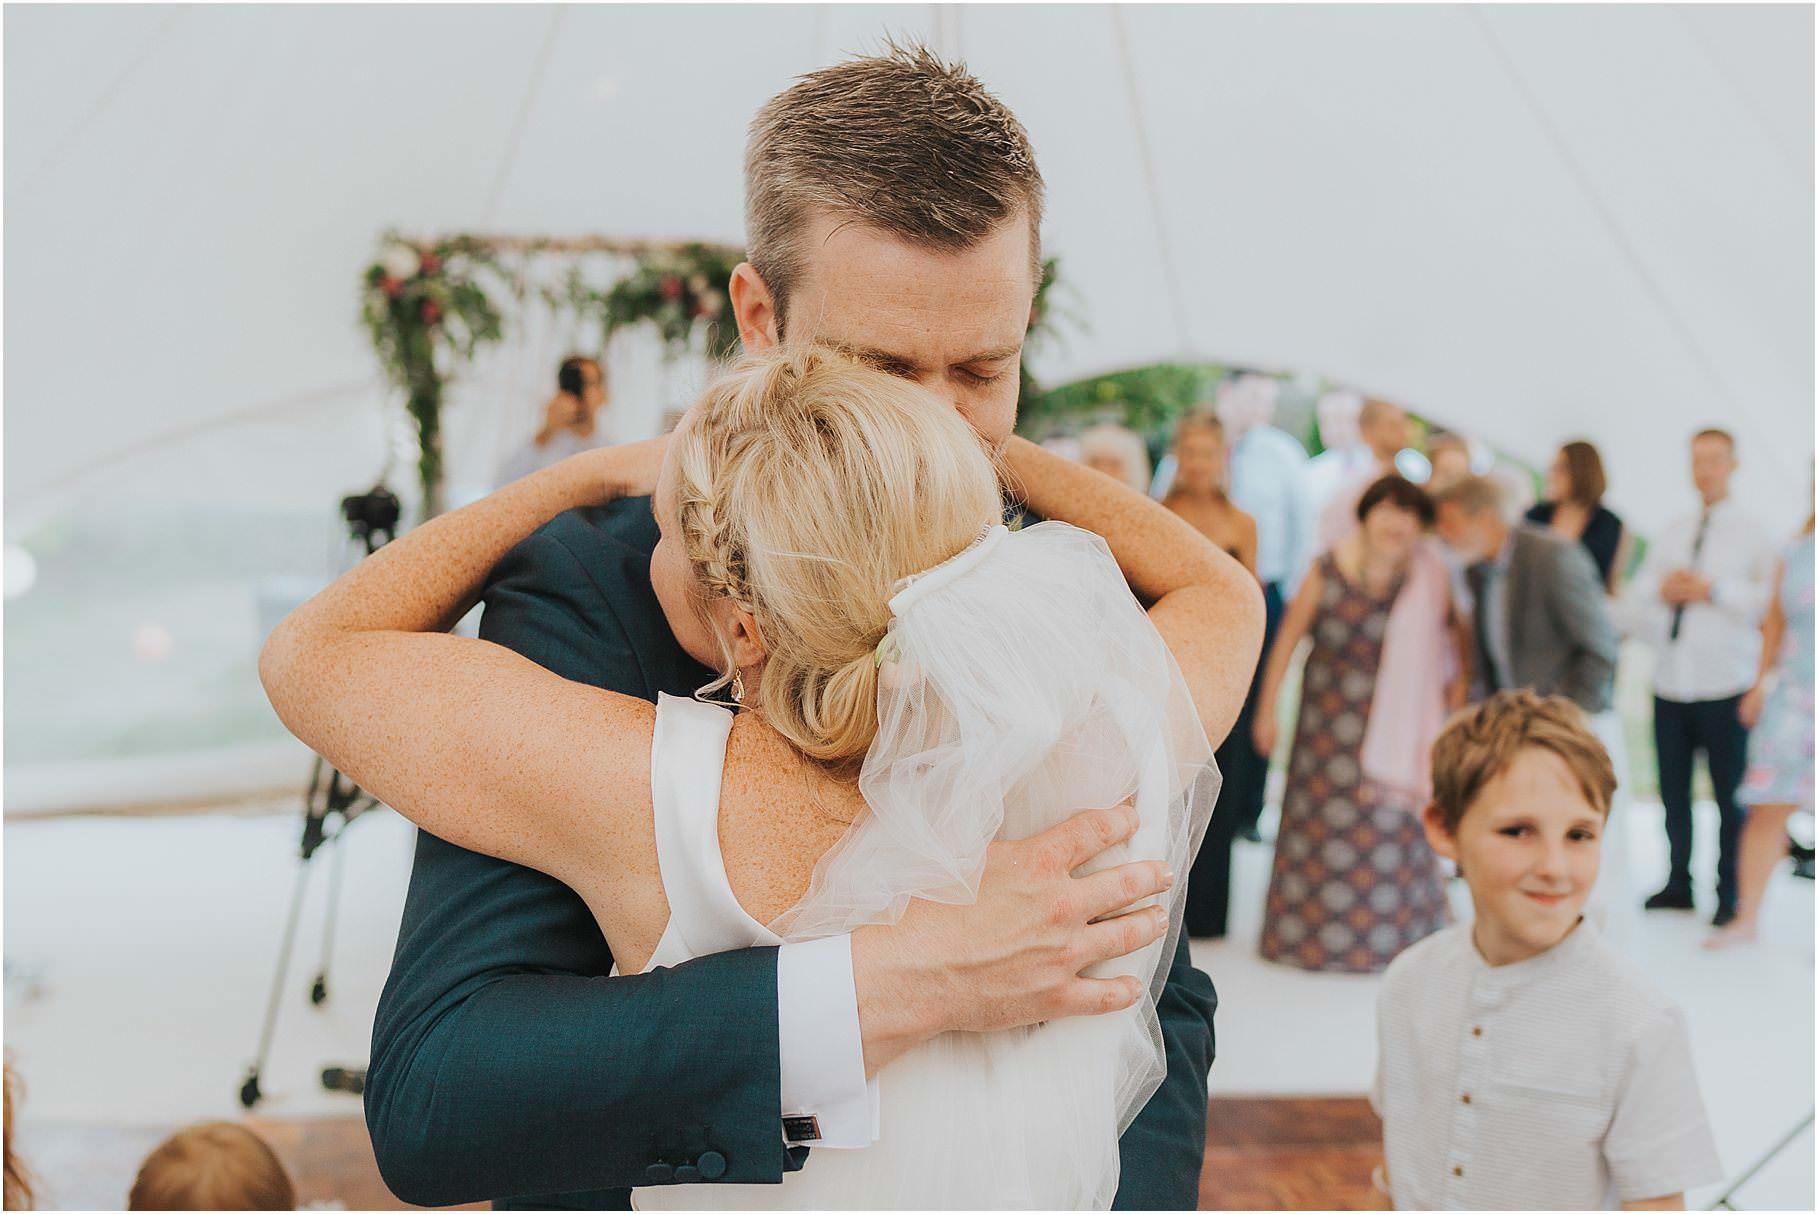 Cambridgeshire Wedding Photographer Black Horse Elton Wedding 1096 - Mr and Mrs Mac // CAMBRIDGESHIRE WEDDING